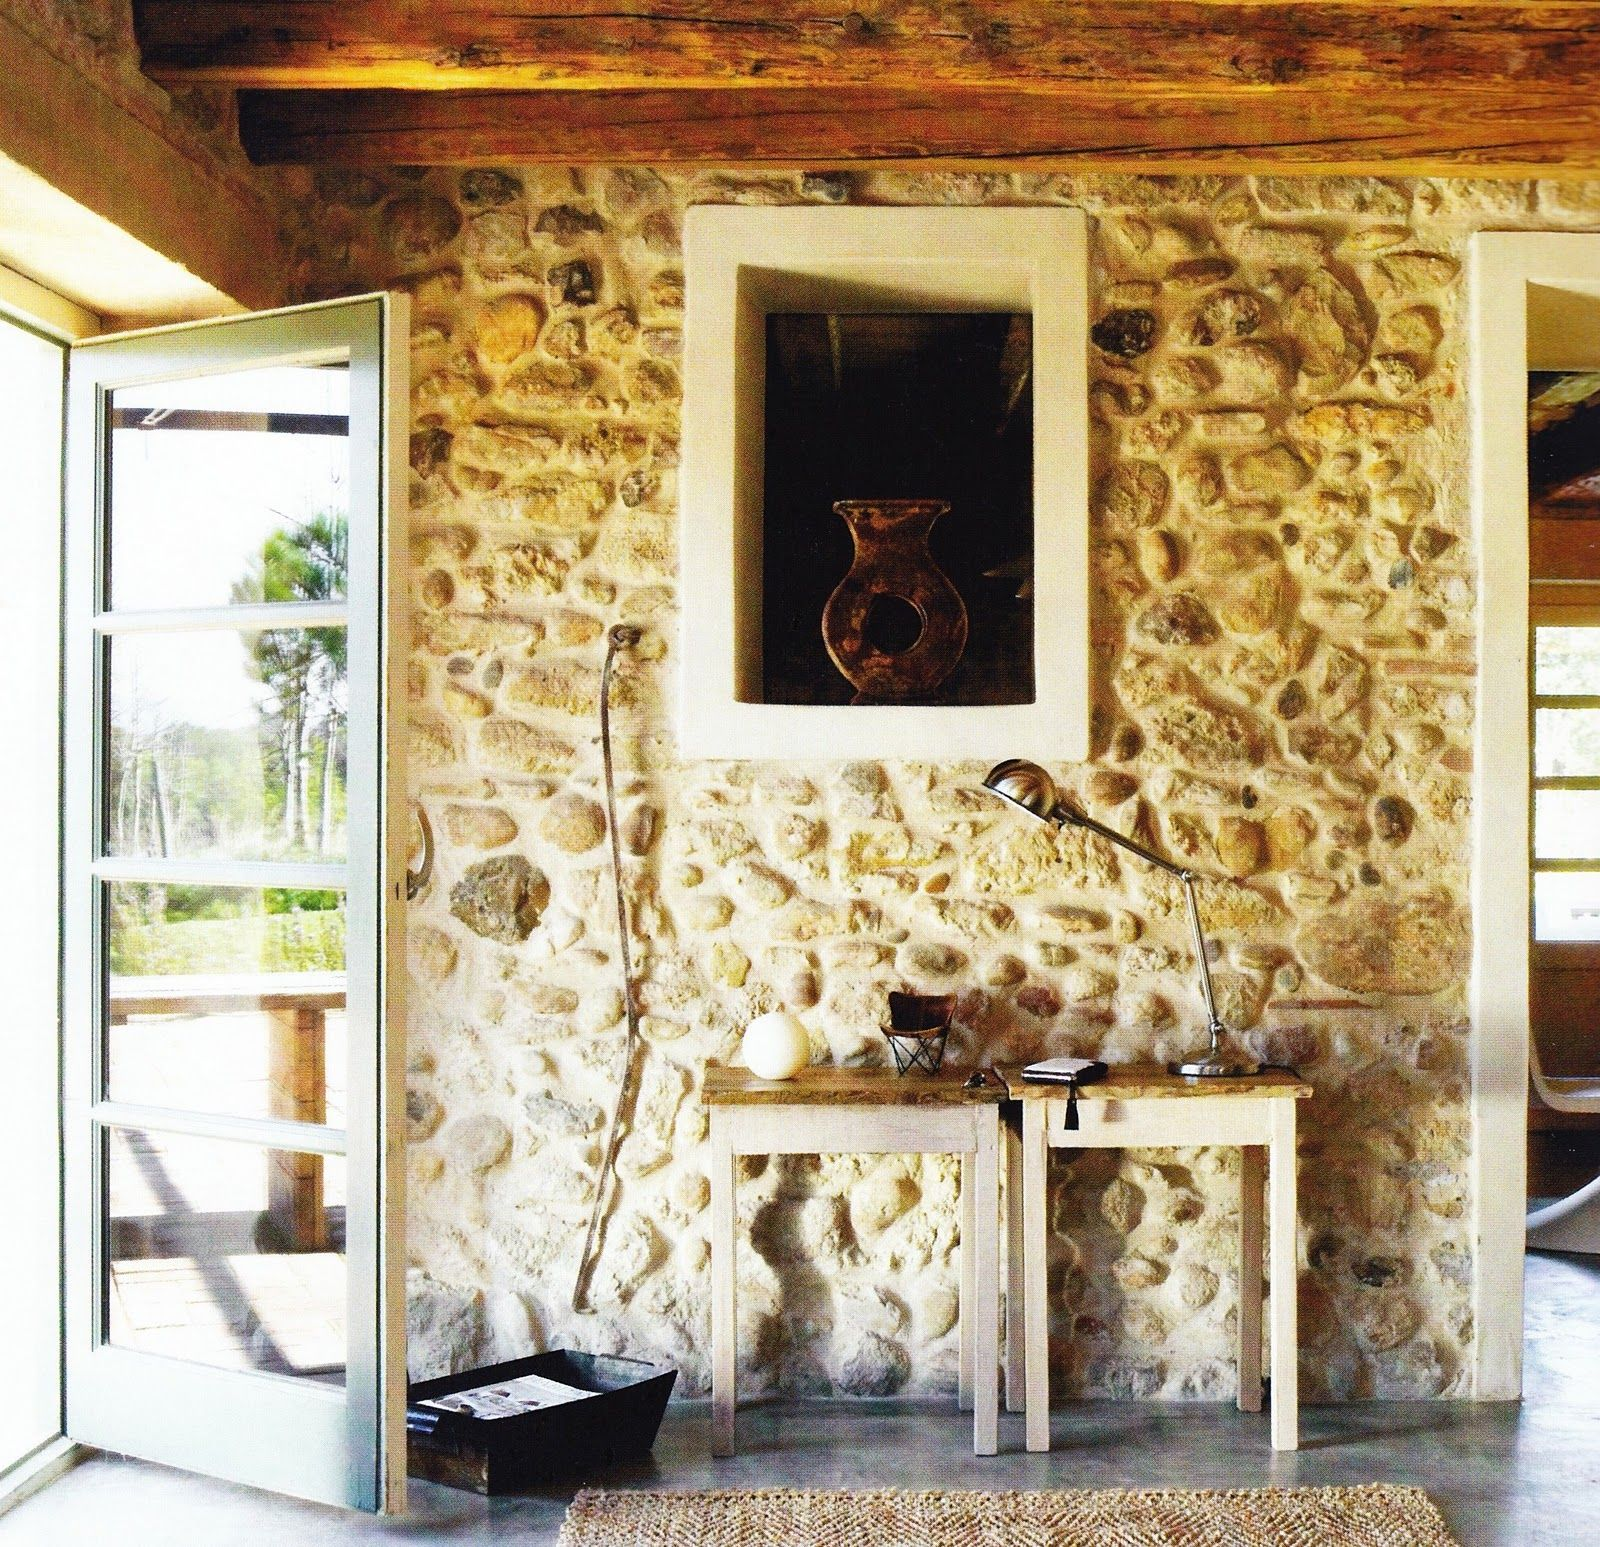 natural lighting | Spanish home | interior design | stone walls ...